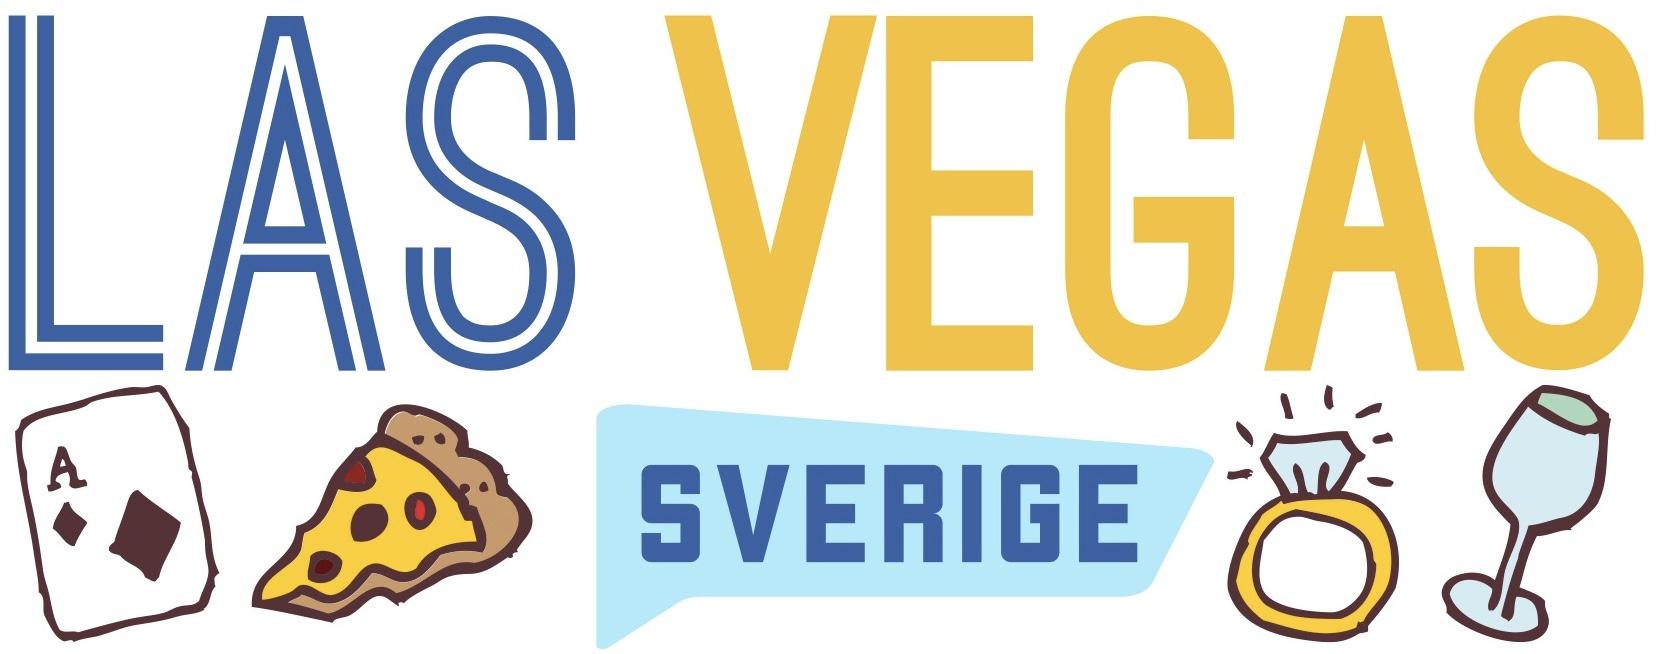 Las Vegas Sverige